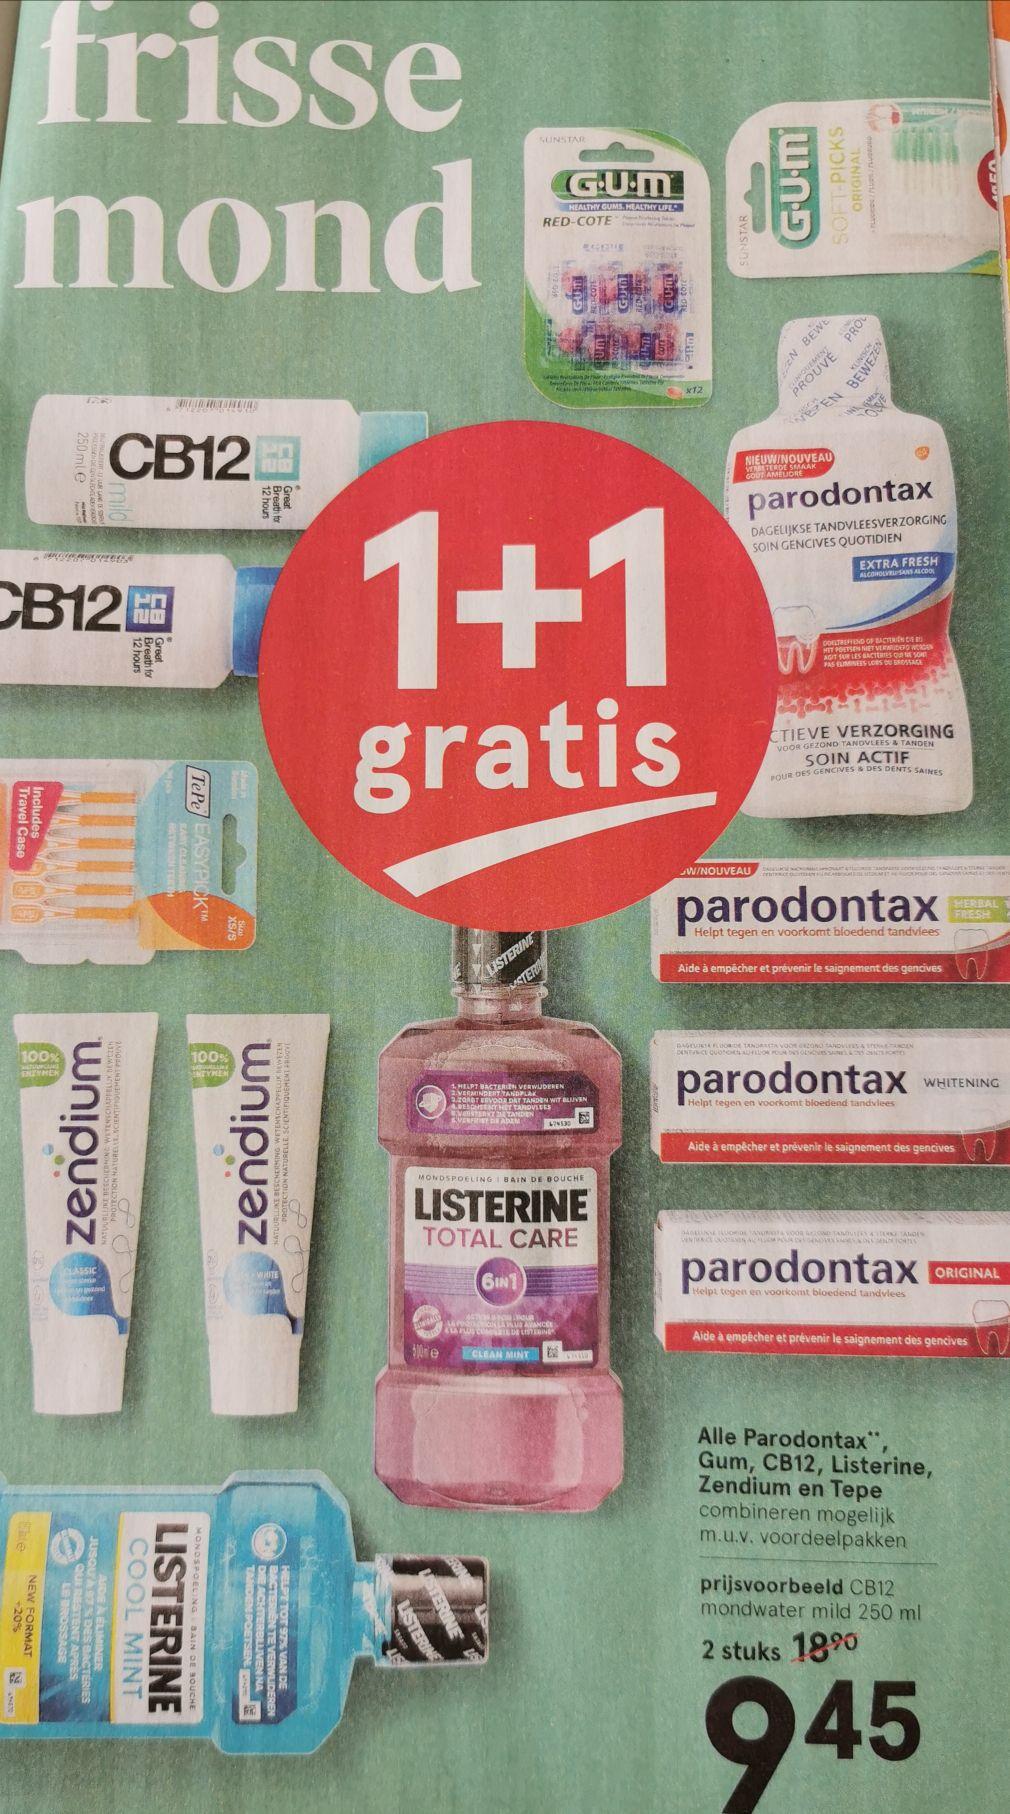 Alle Parodontax, Gum, CB12, Listerine, Zendium en Tepe 1 + 1 gratis @ Etos